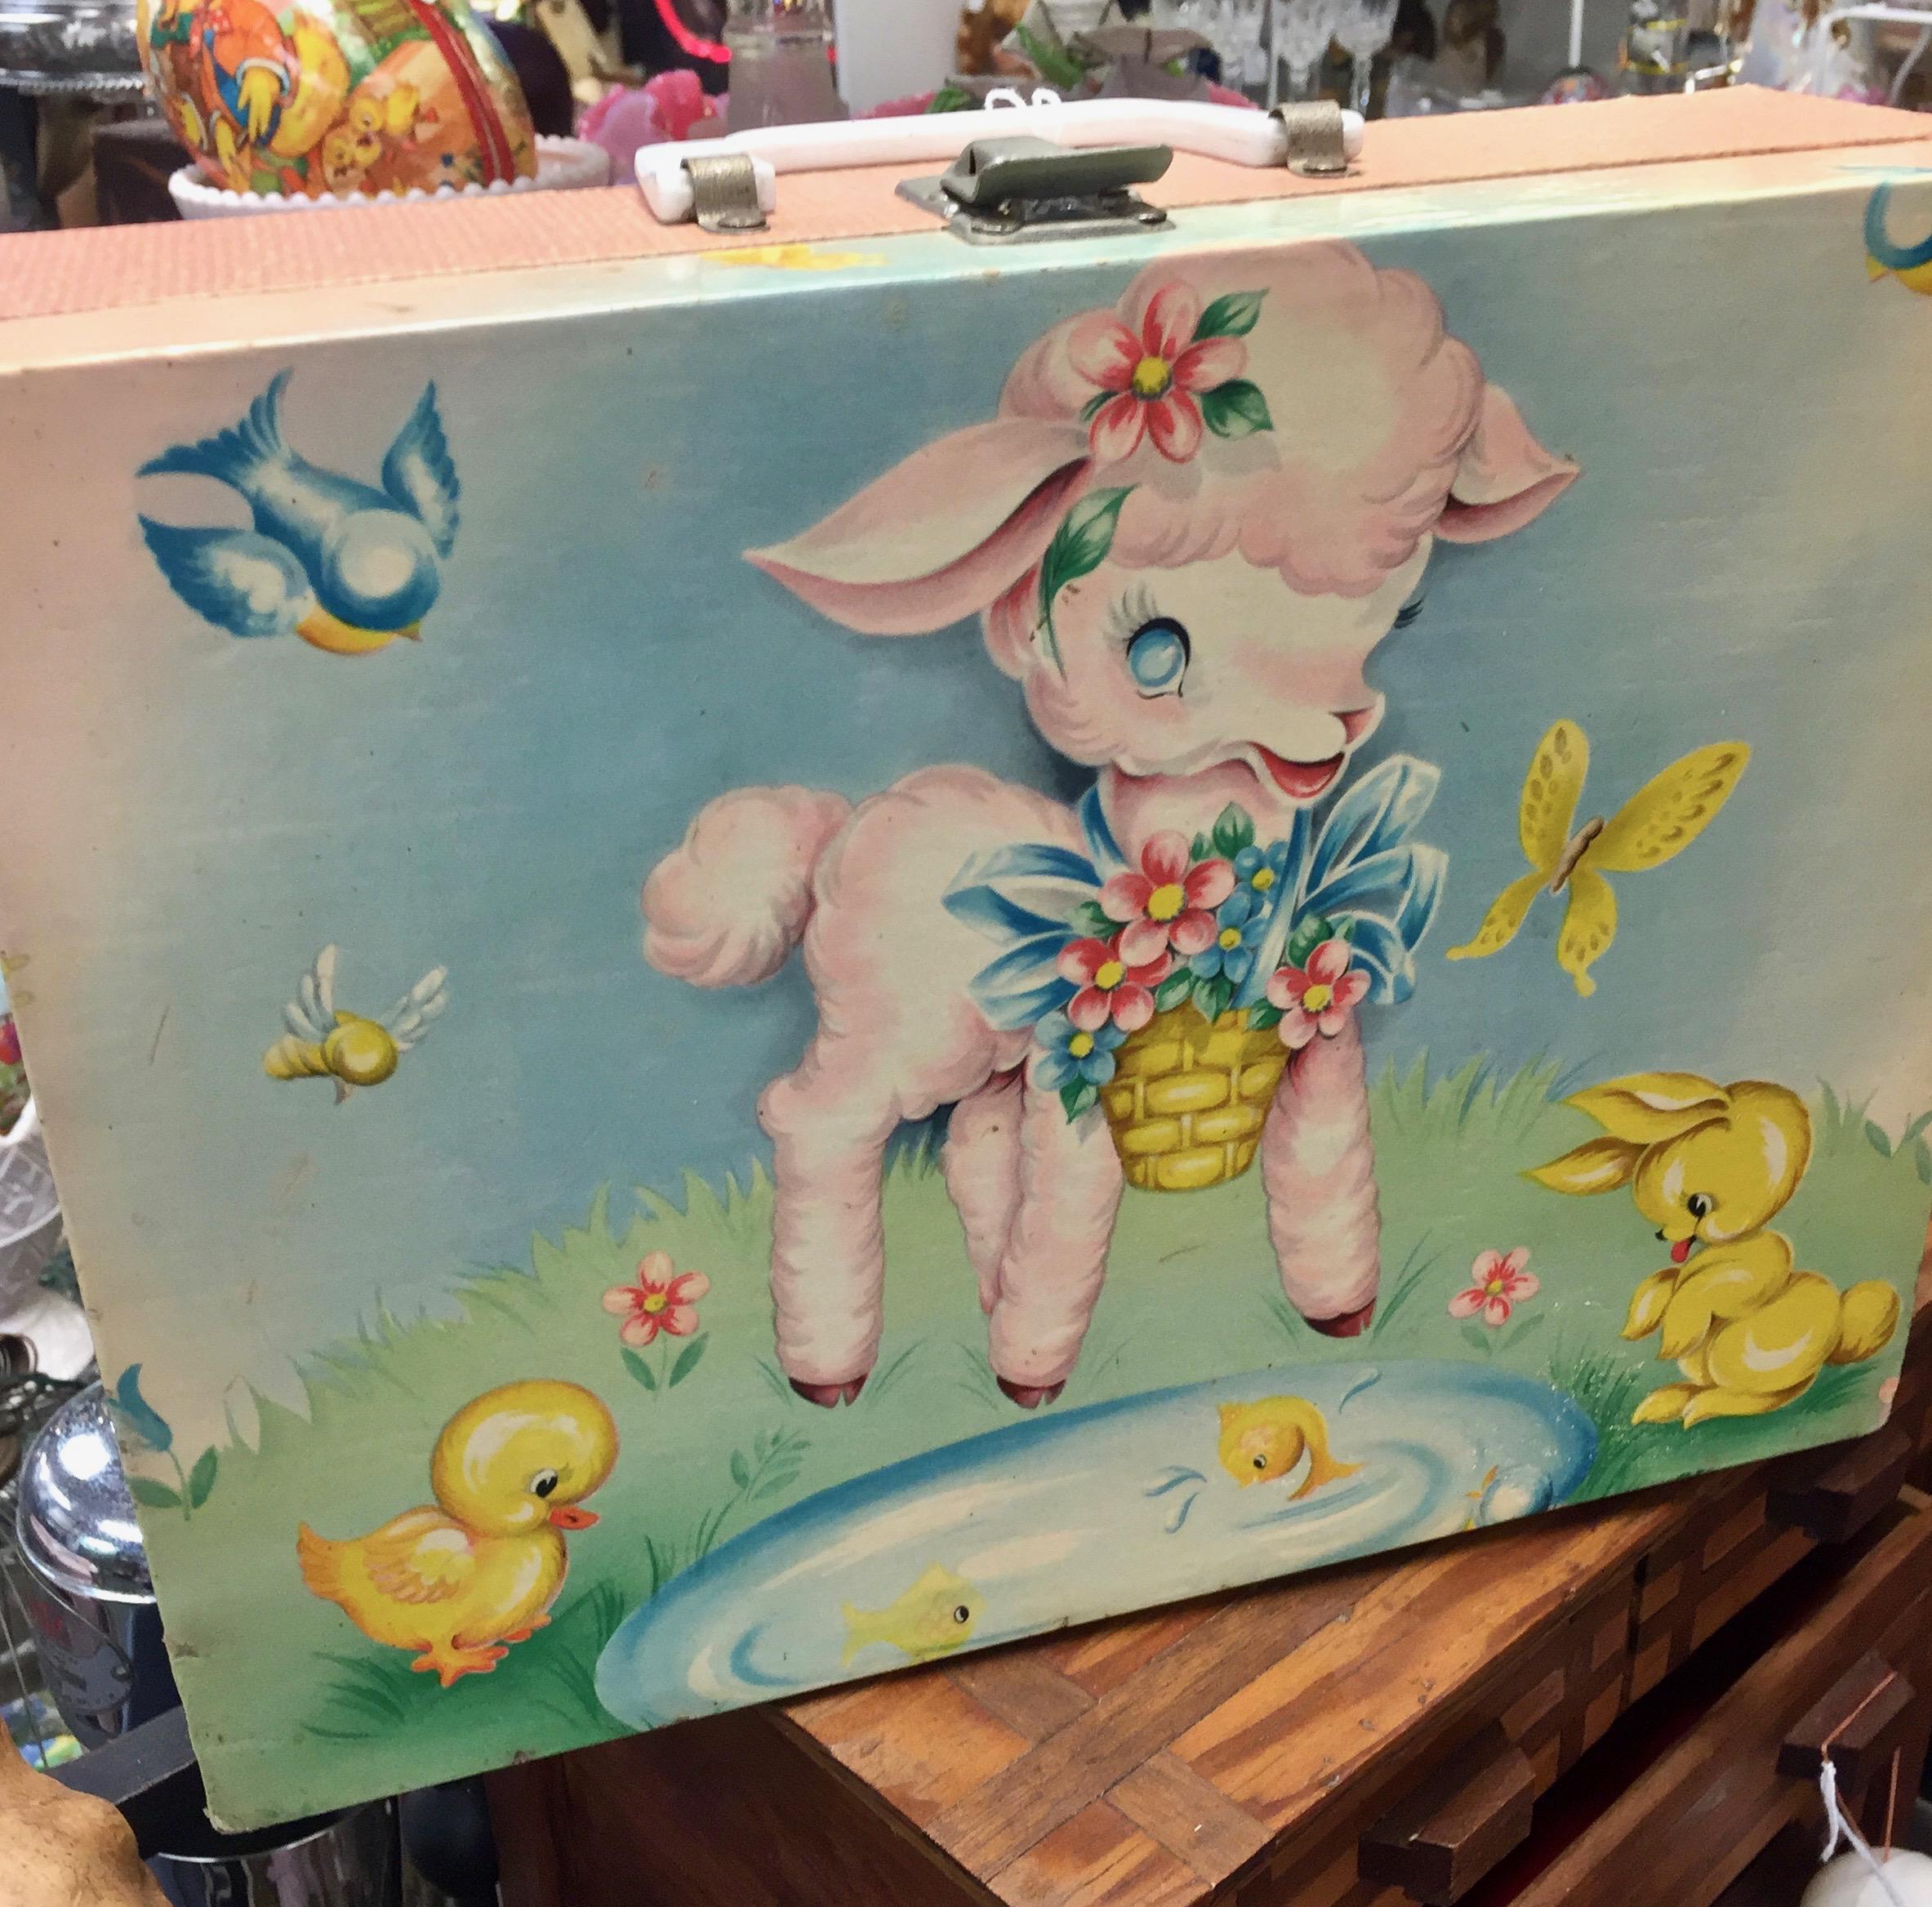 Vintage Children's Suitcase